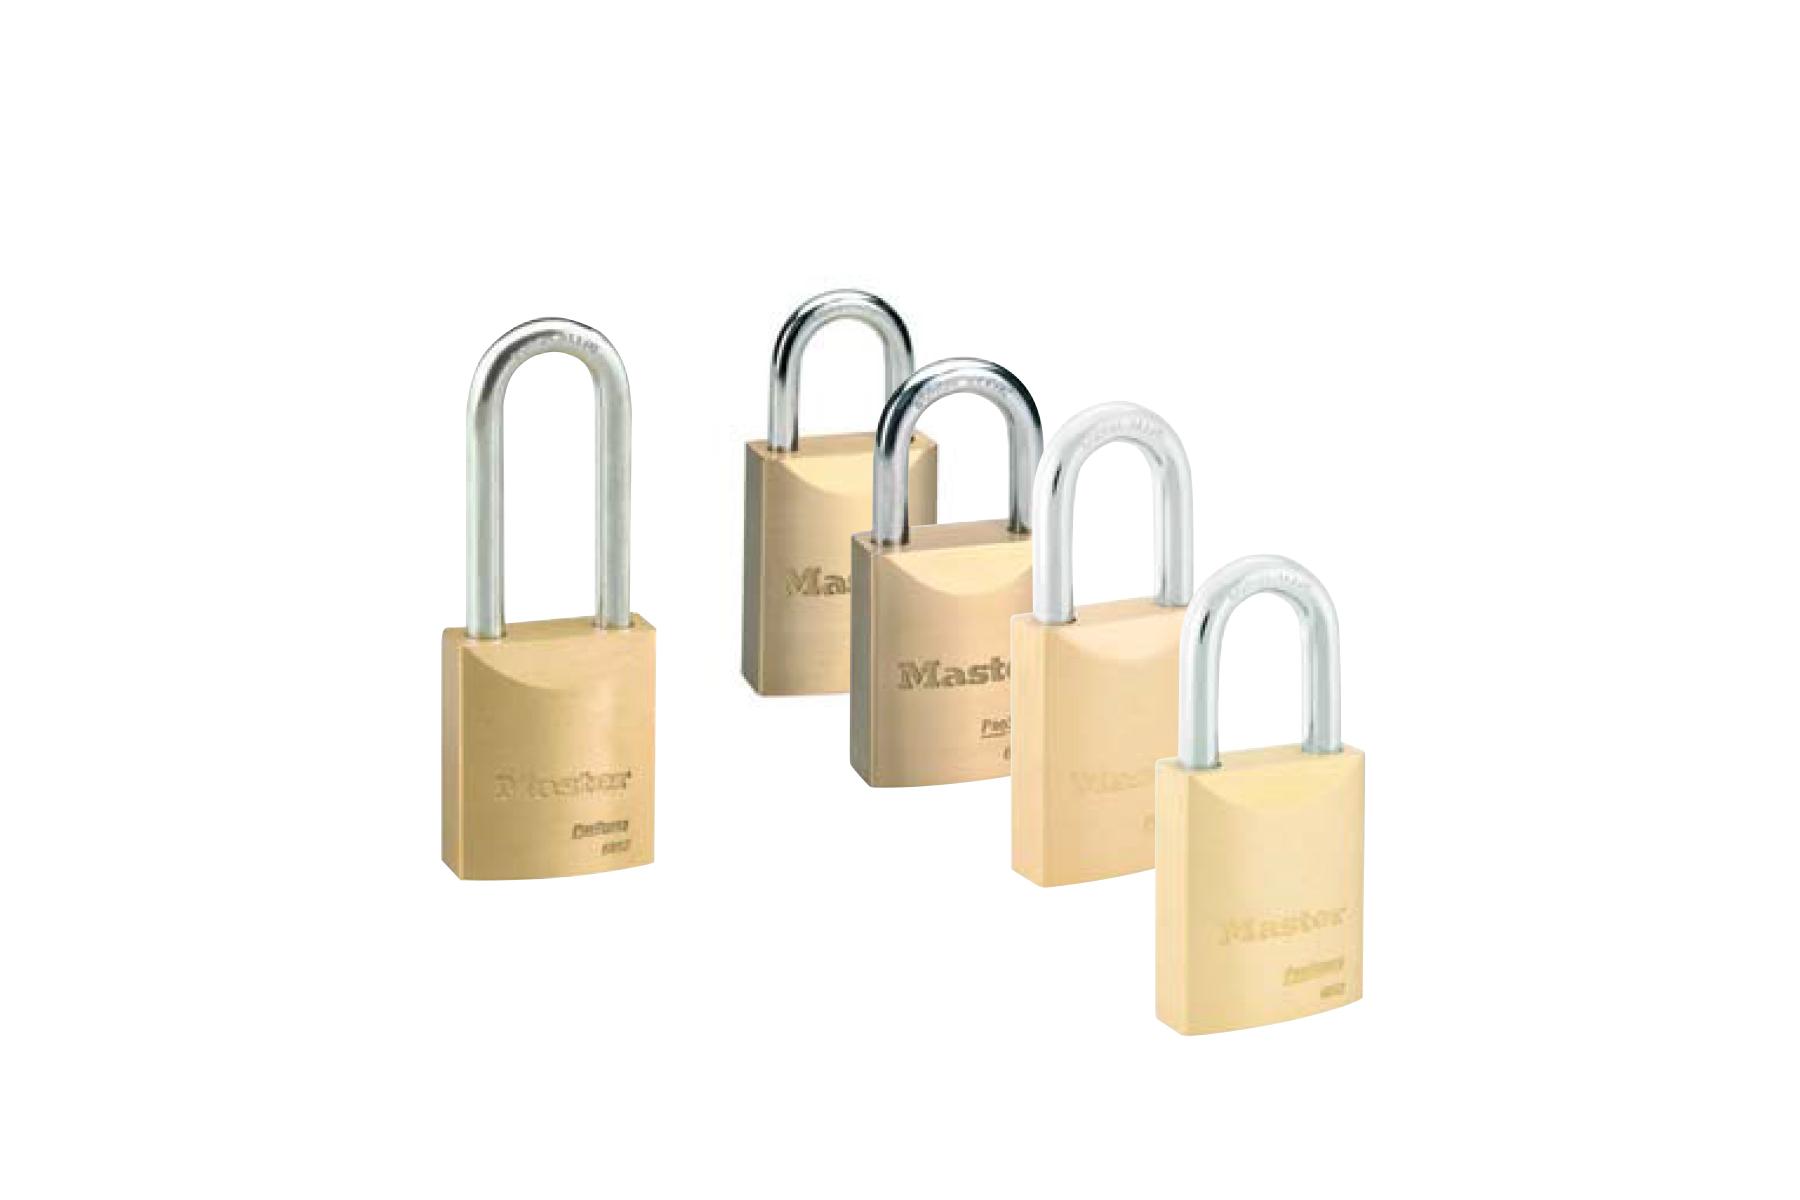 Master Lock Pro Series Solid Brass Padlocks